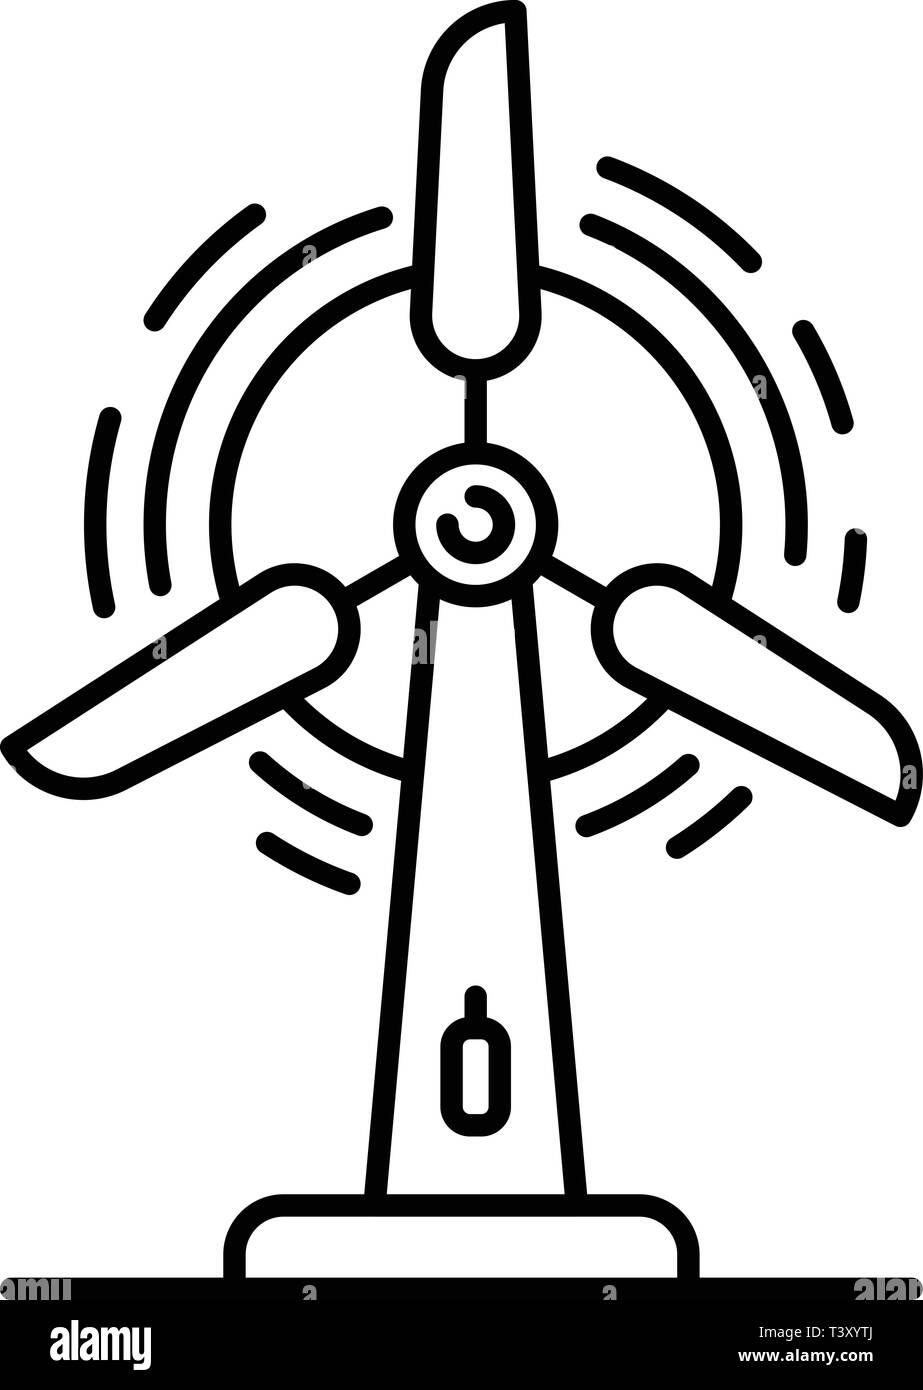 City wind turbine icon, outline style - Stock Image